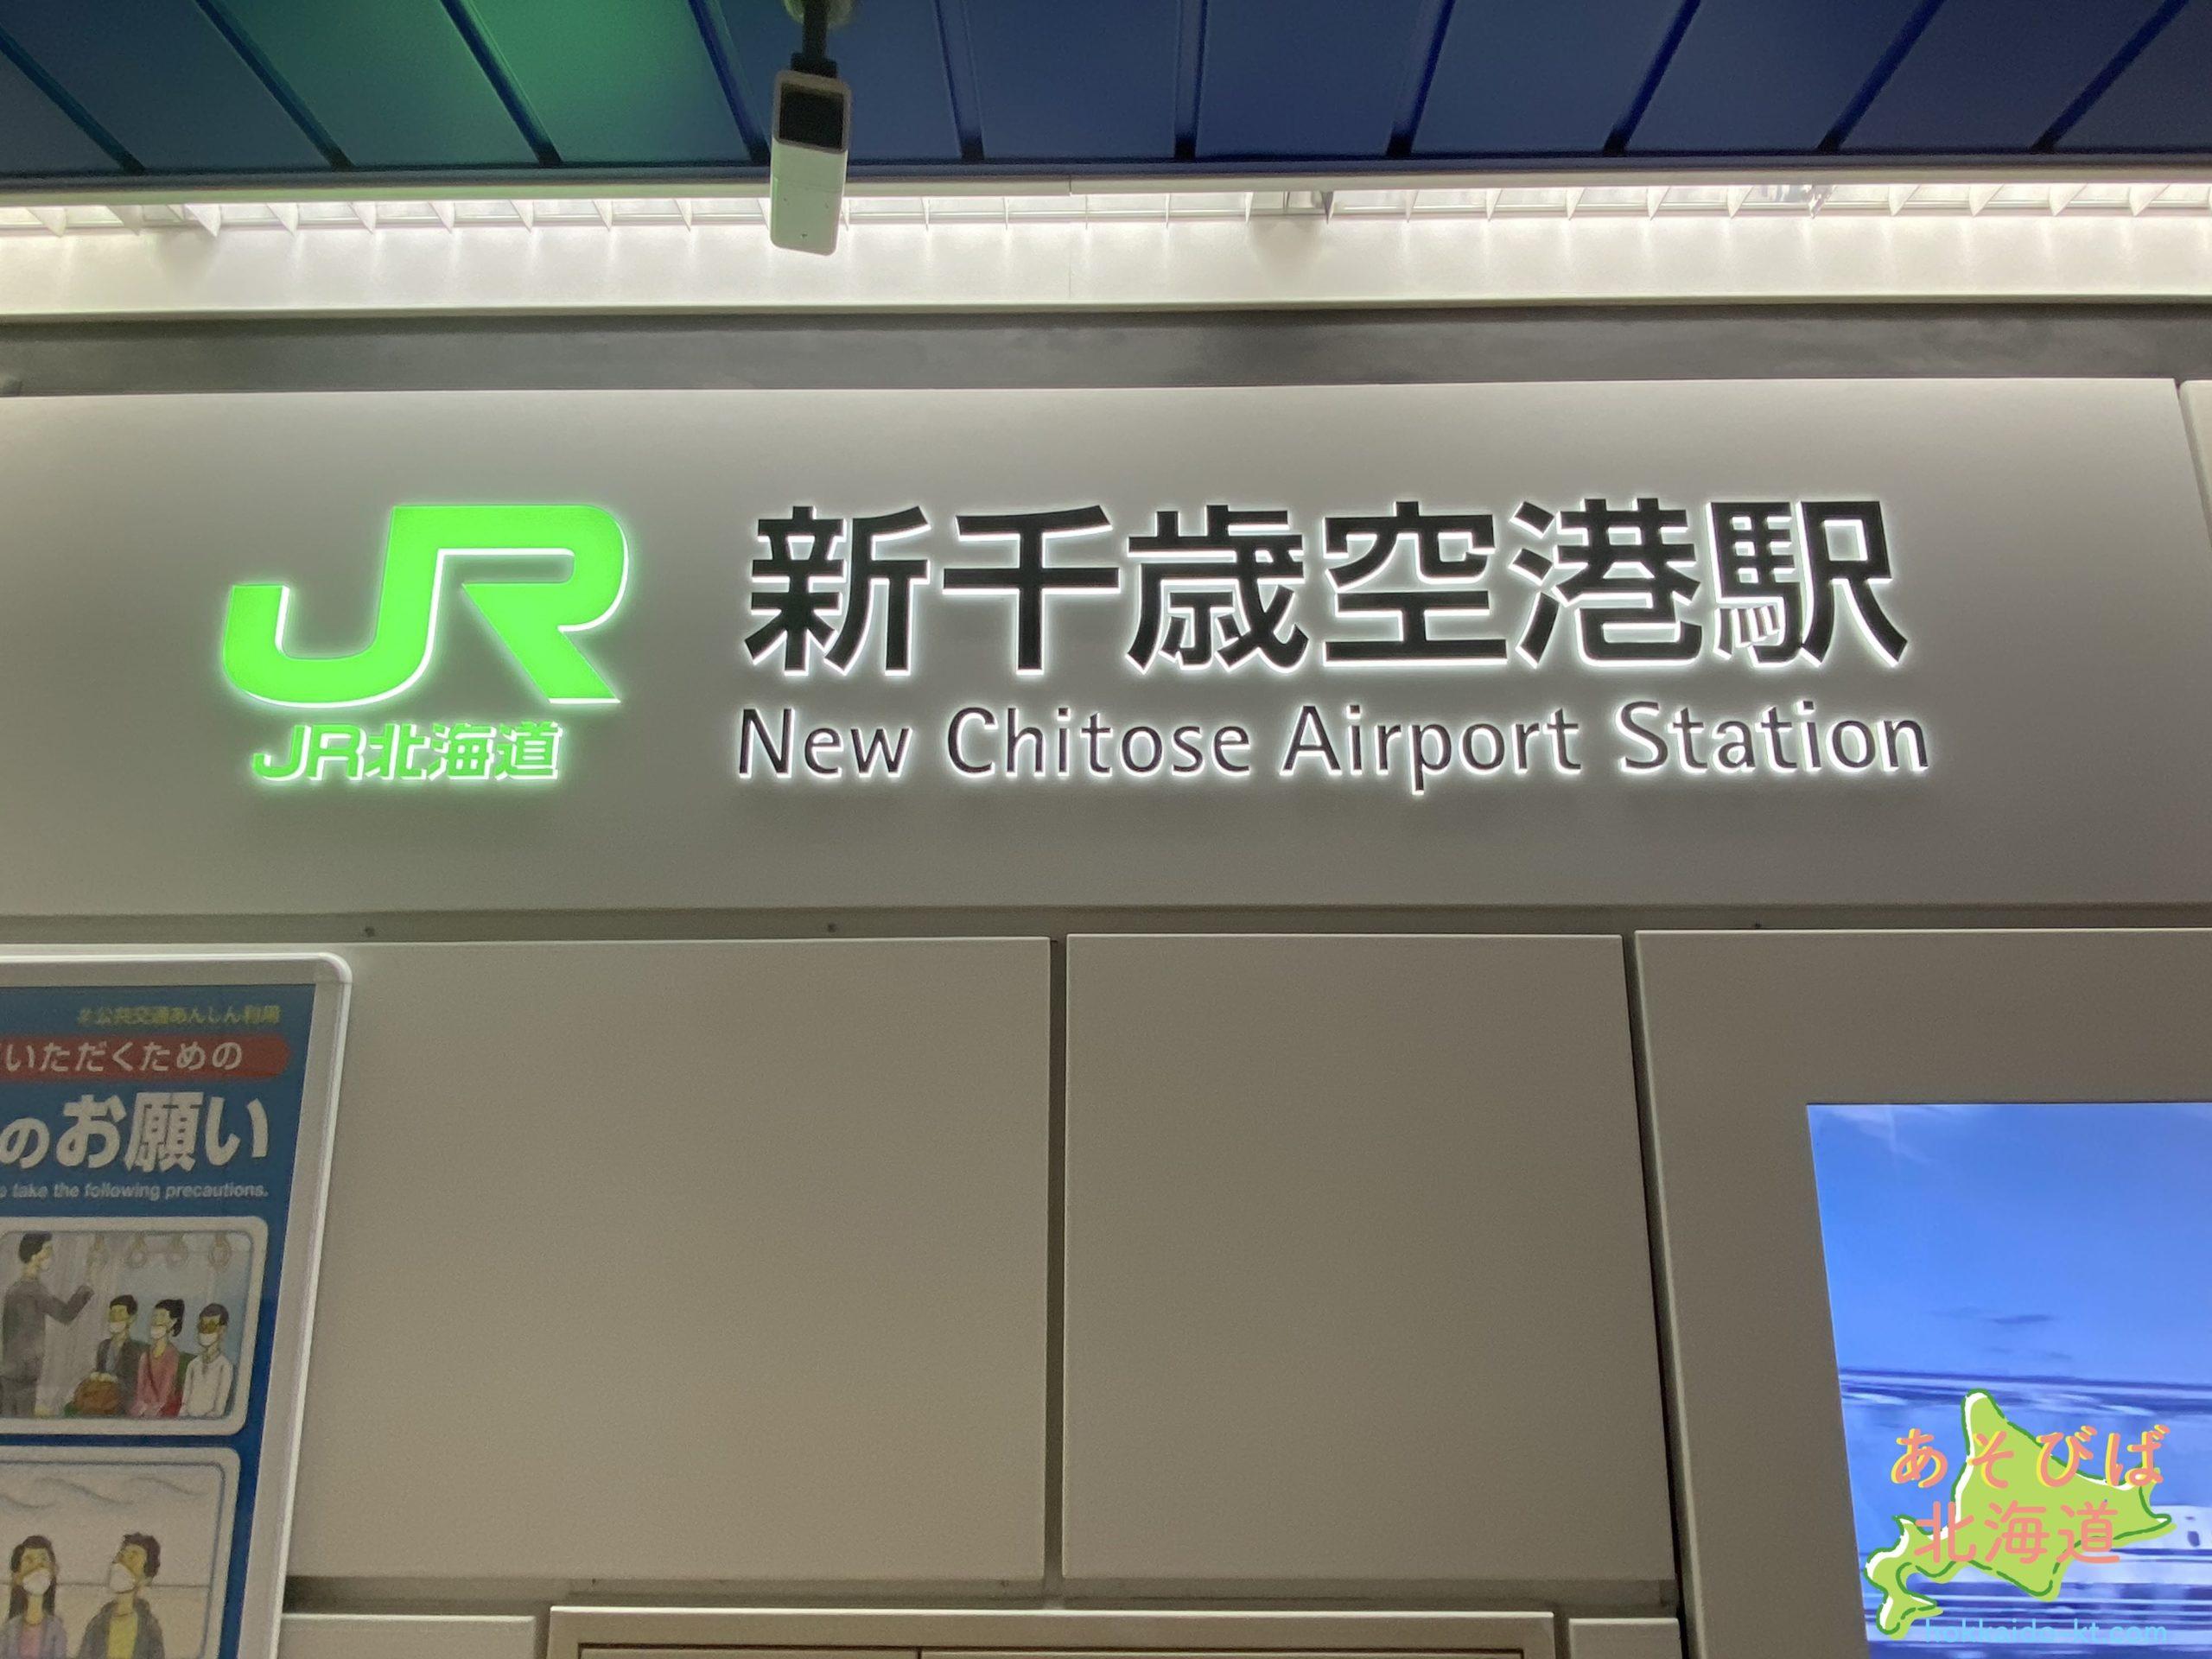 JR新千歳空港駅看板